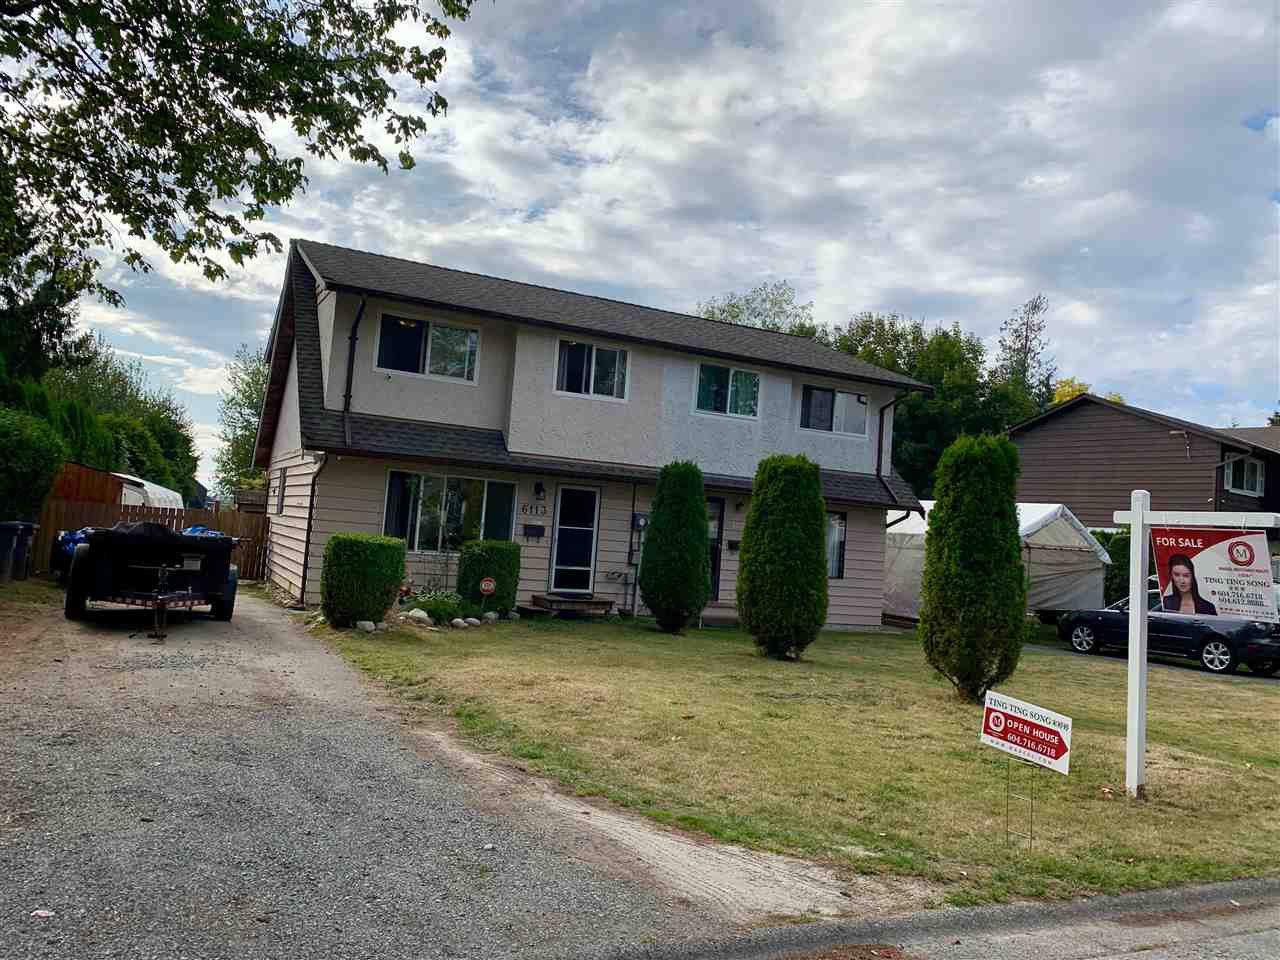 Main Photo: 6113 MORGAN Drive in Surrey: Cloverdale BC House 1/2 Duplex for sale (Cloverdale)  : MLS®# R2400124